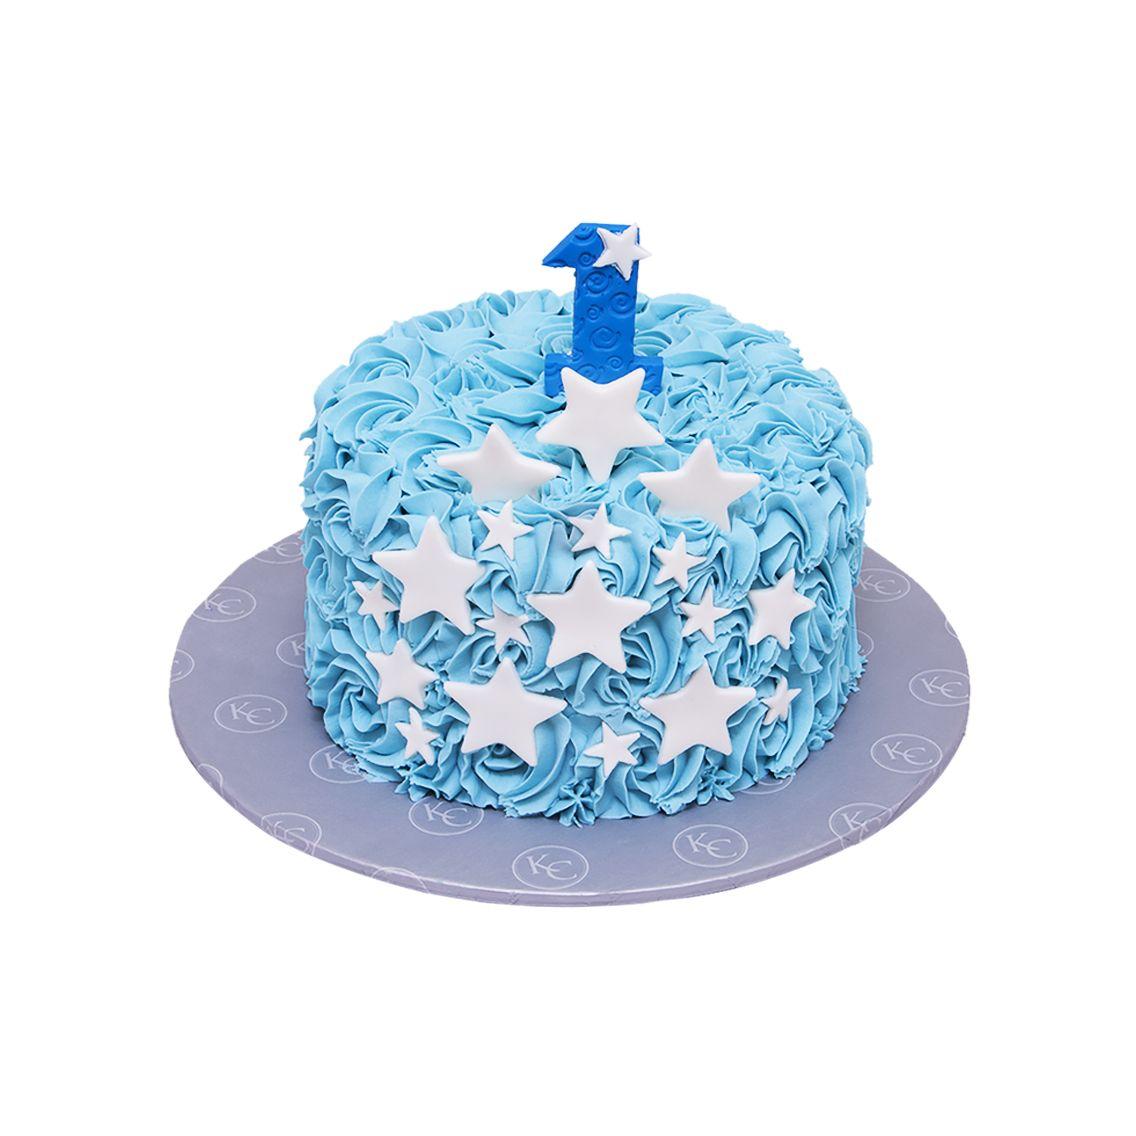 Kitchen Cuisine Default Category Blue Star Rosette Cake